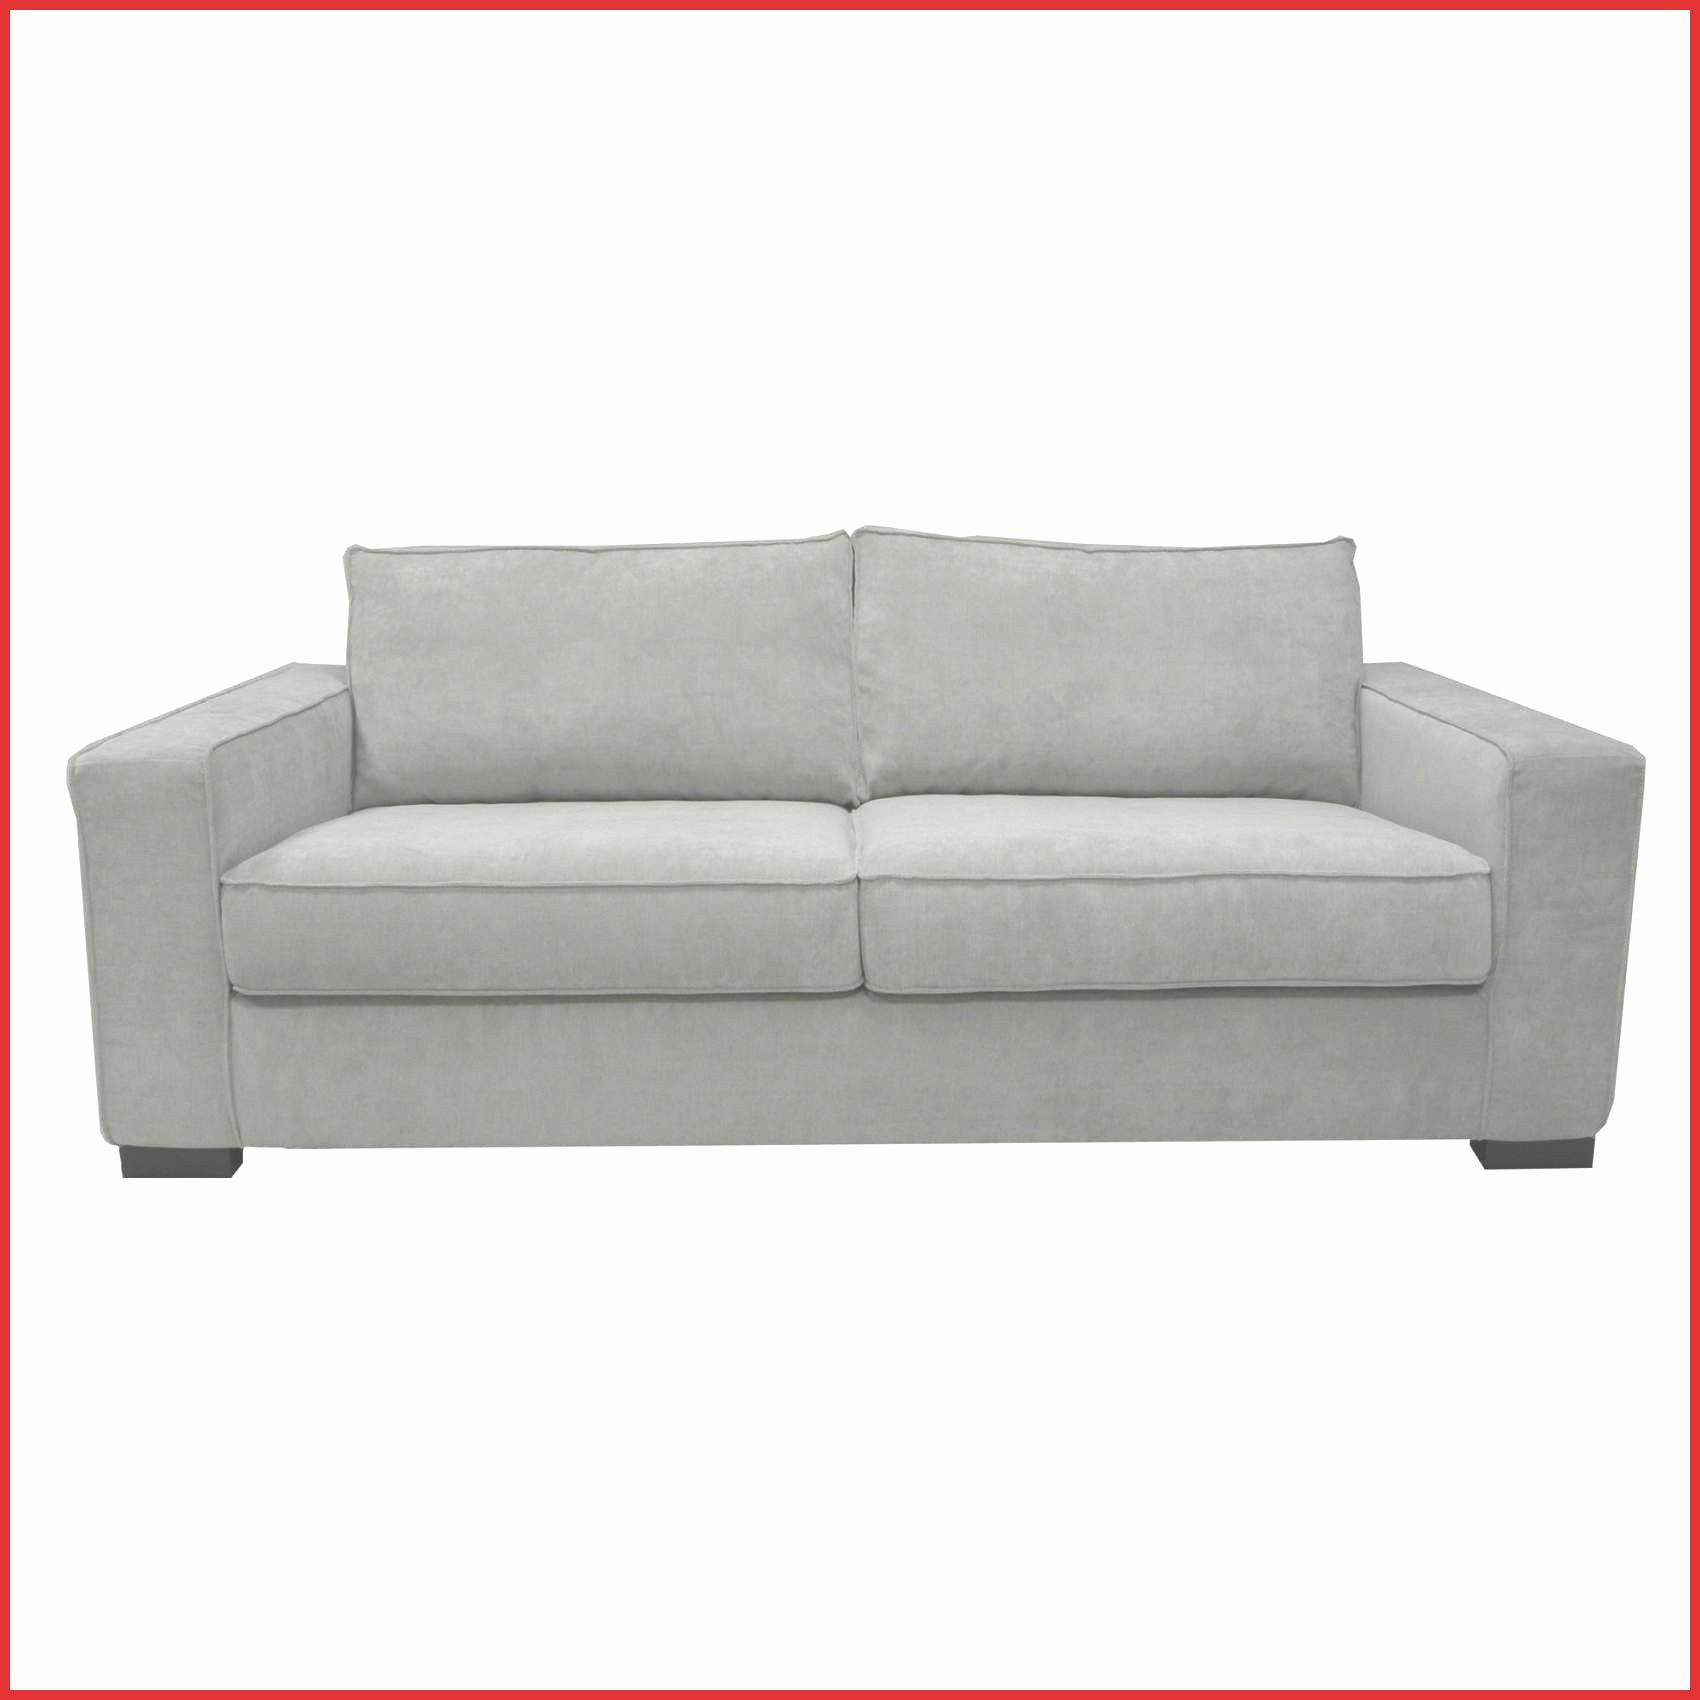 Canapé D Angle Ikea Convertible Beau Photos Canap Convertible 3 Places Conforama 6 Cuir 1 Avec S Et Full